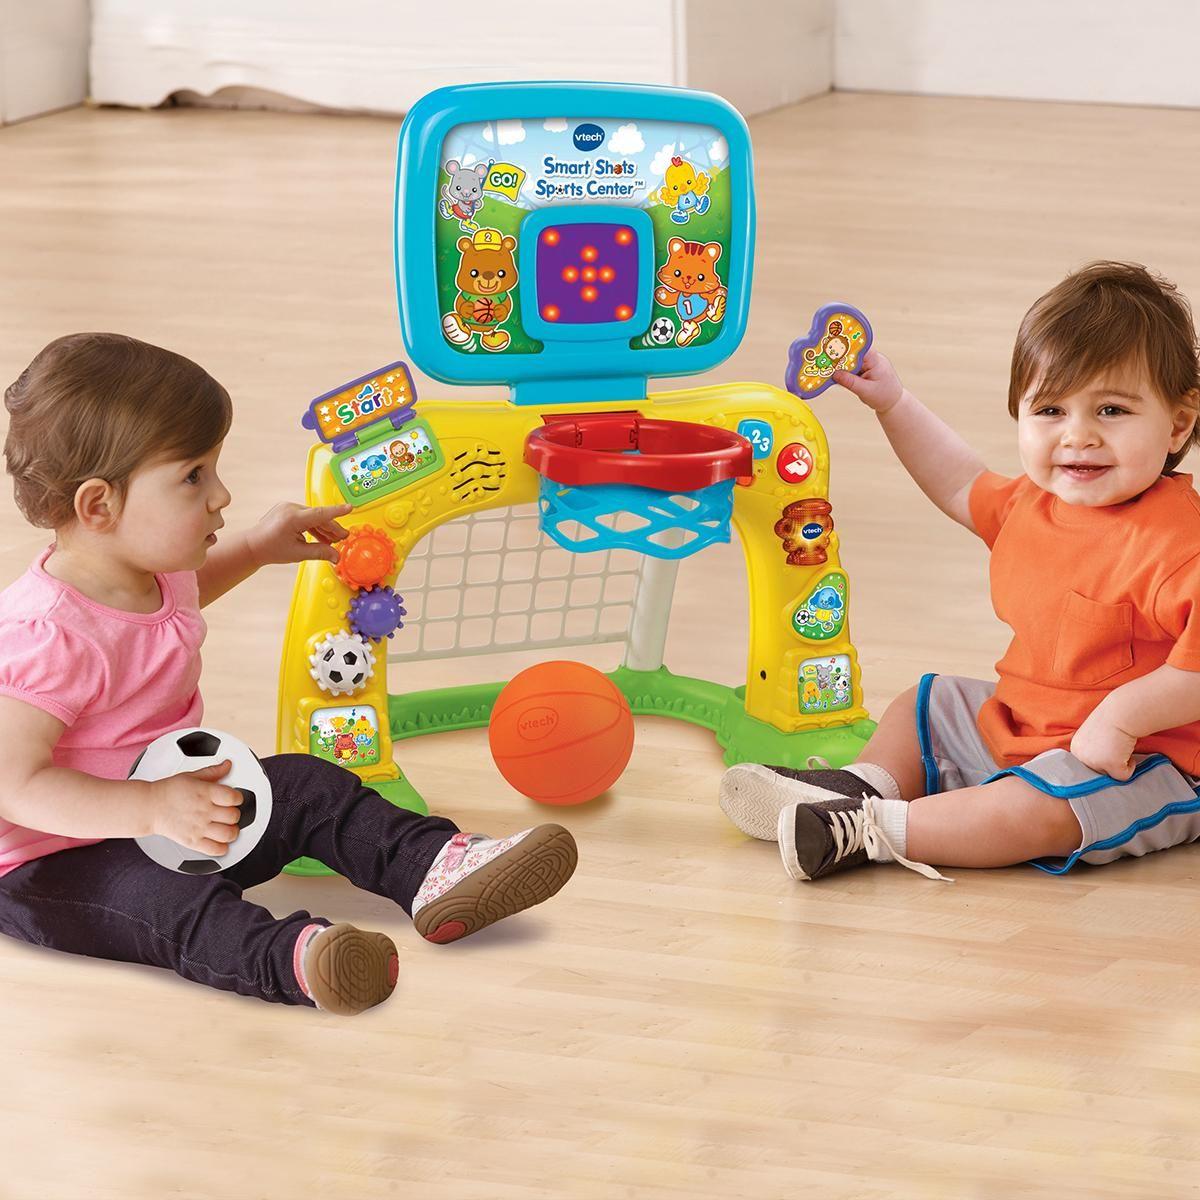 VTech Smart Shots Sports Center Toys & Games